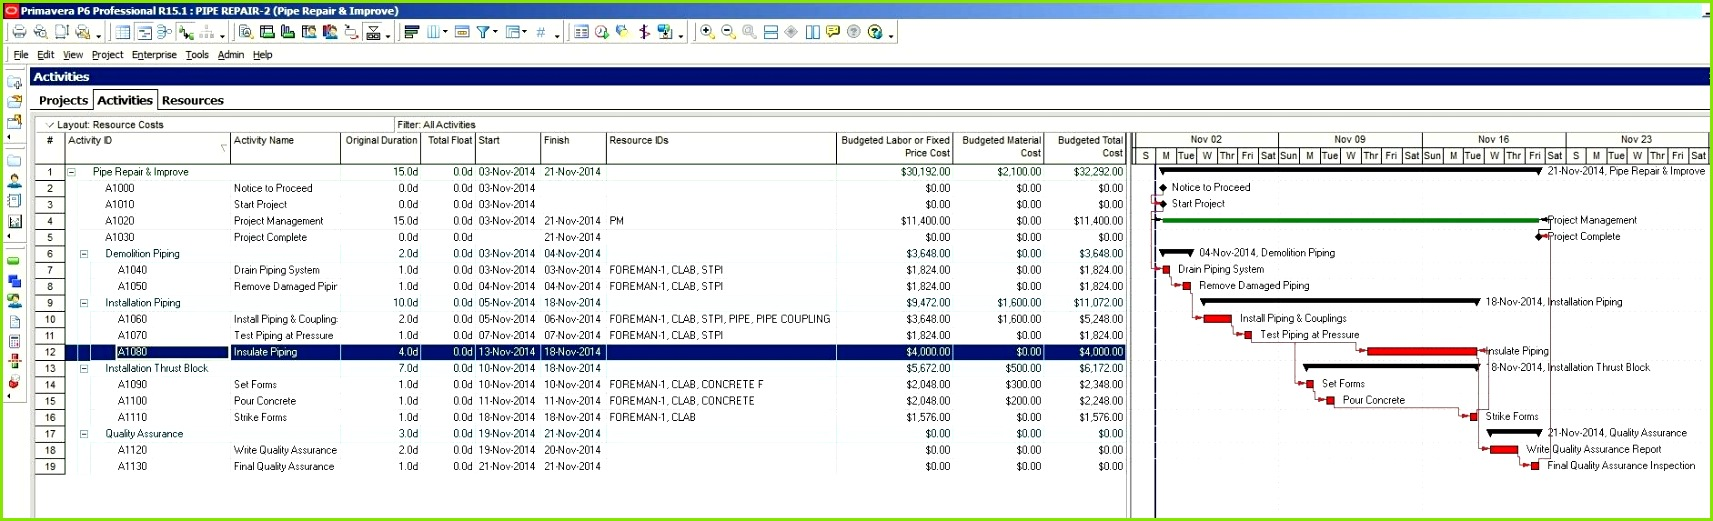 Marketing Bud Sample Amazing Design Template Microsoft Excel Bud Template